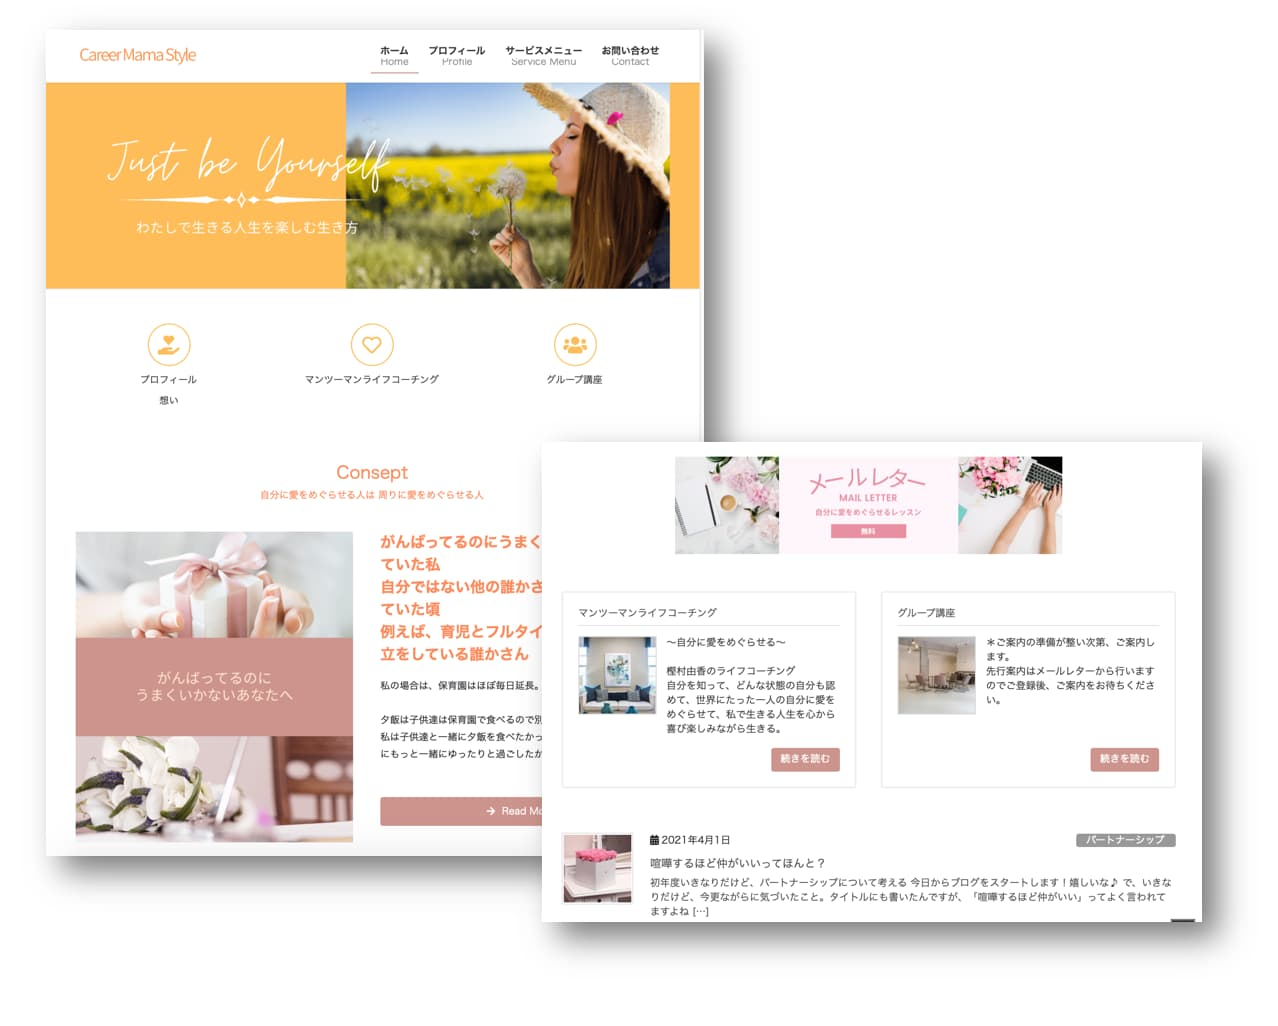 WordPressオンラインレッスン事例